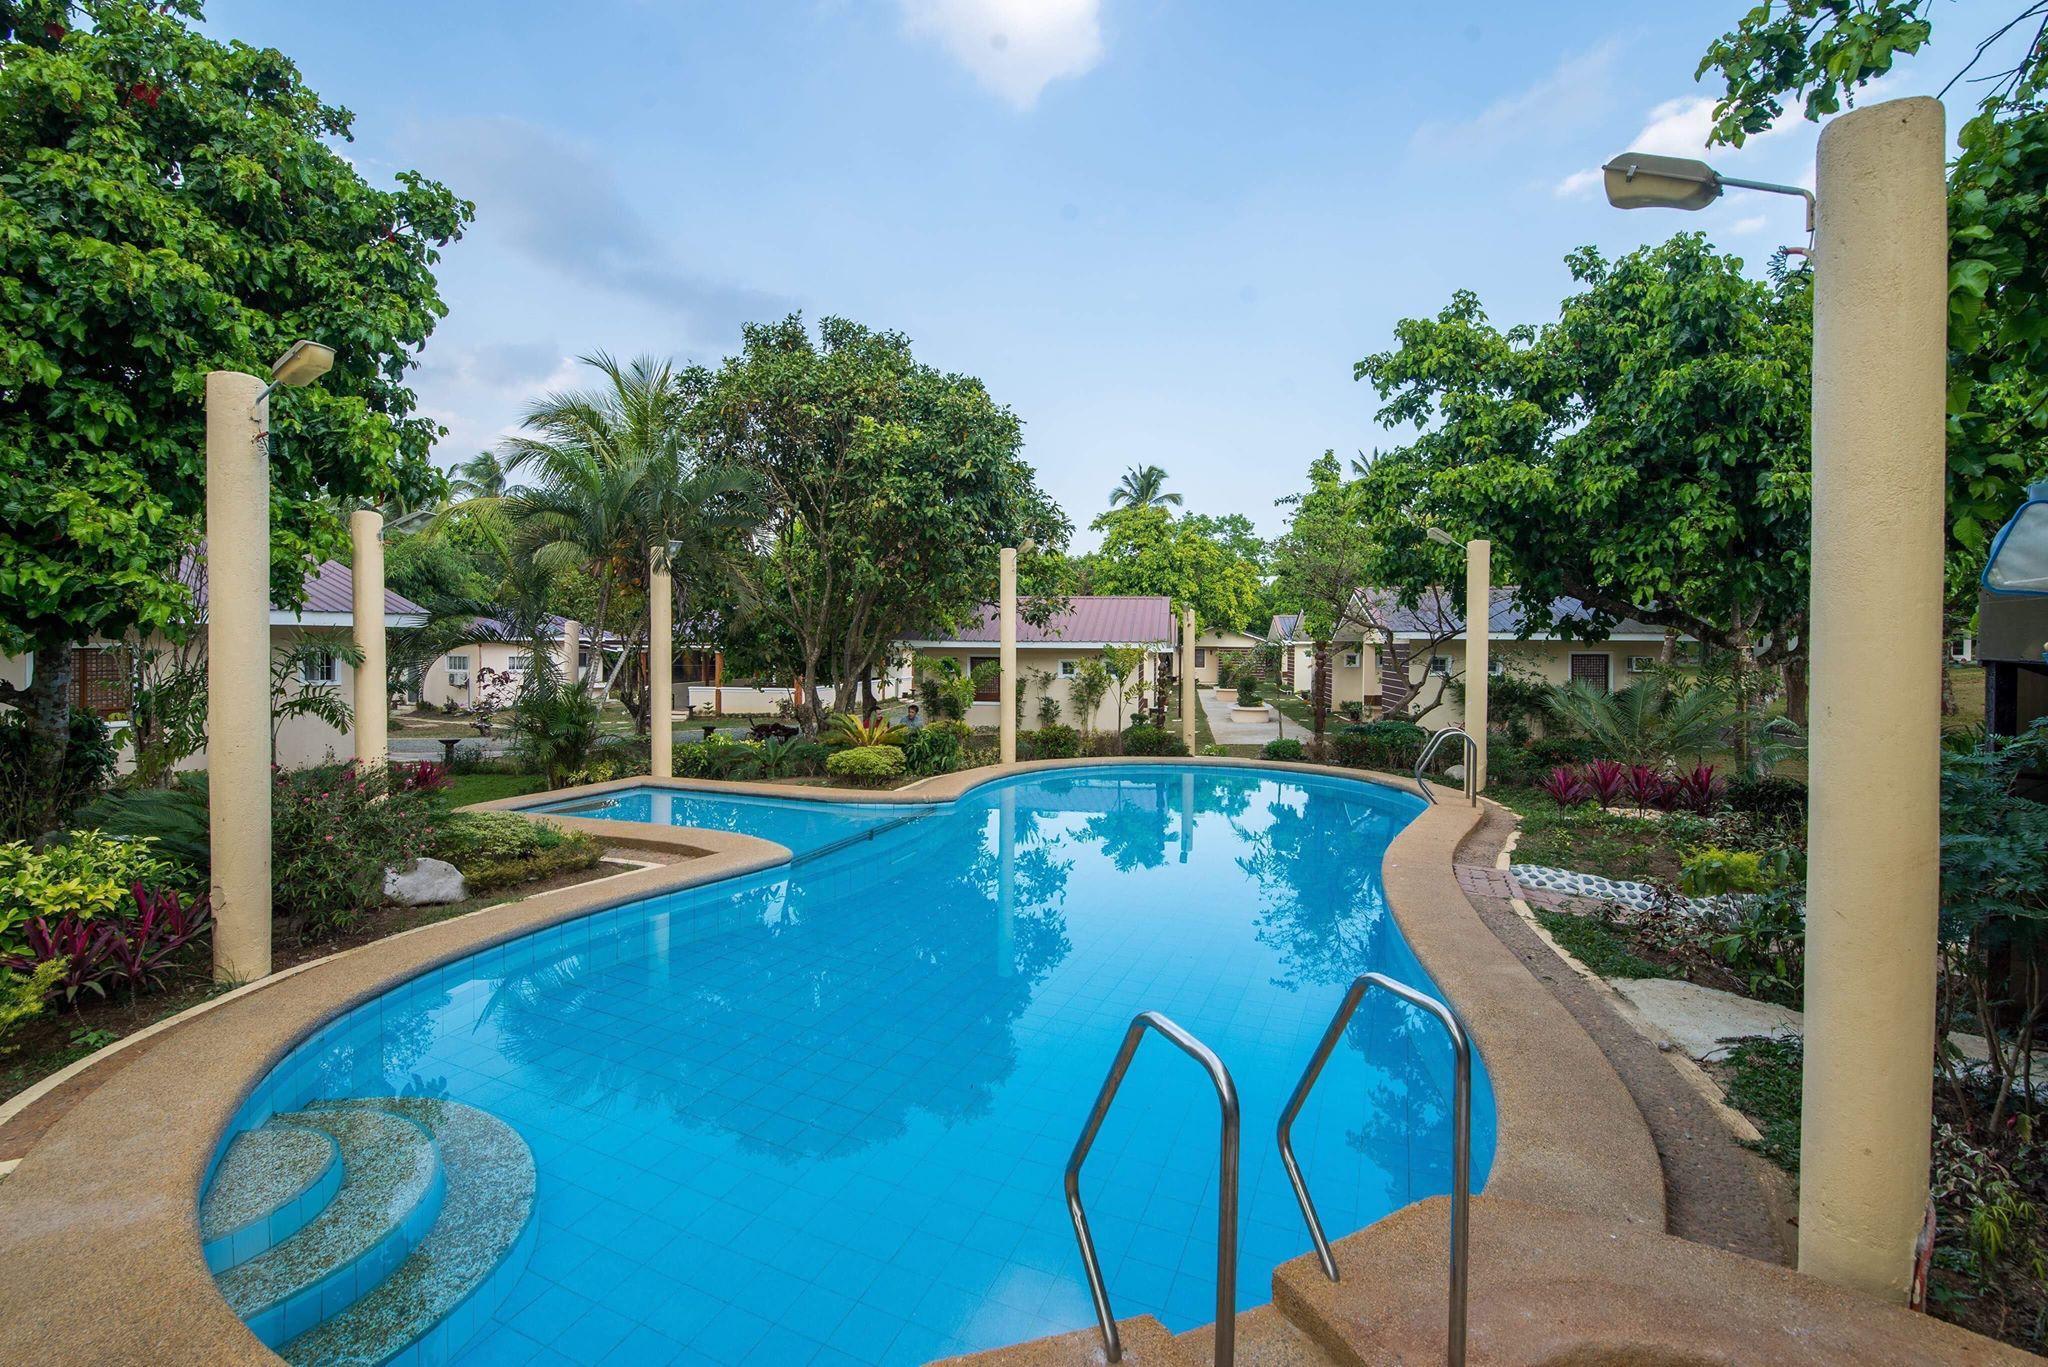 Siglo Paraiso Farm Resort